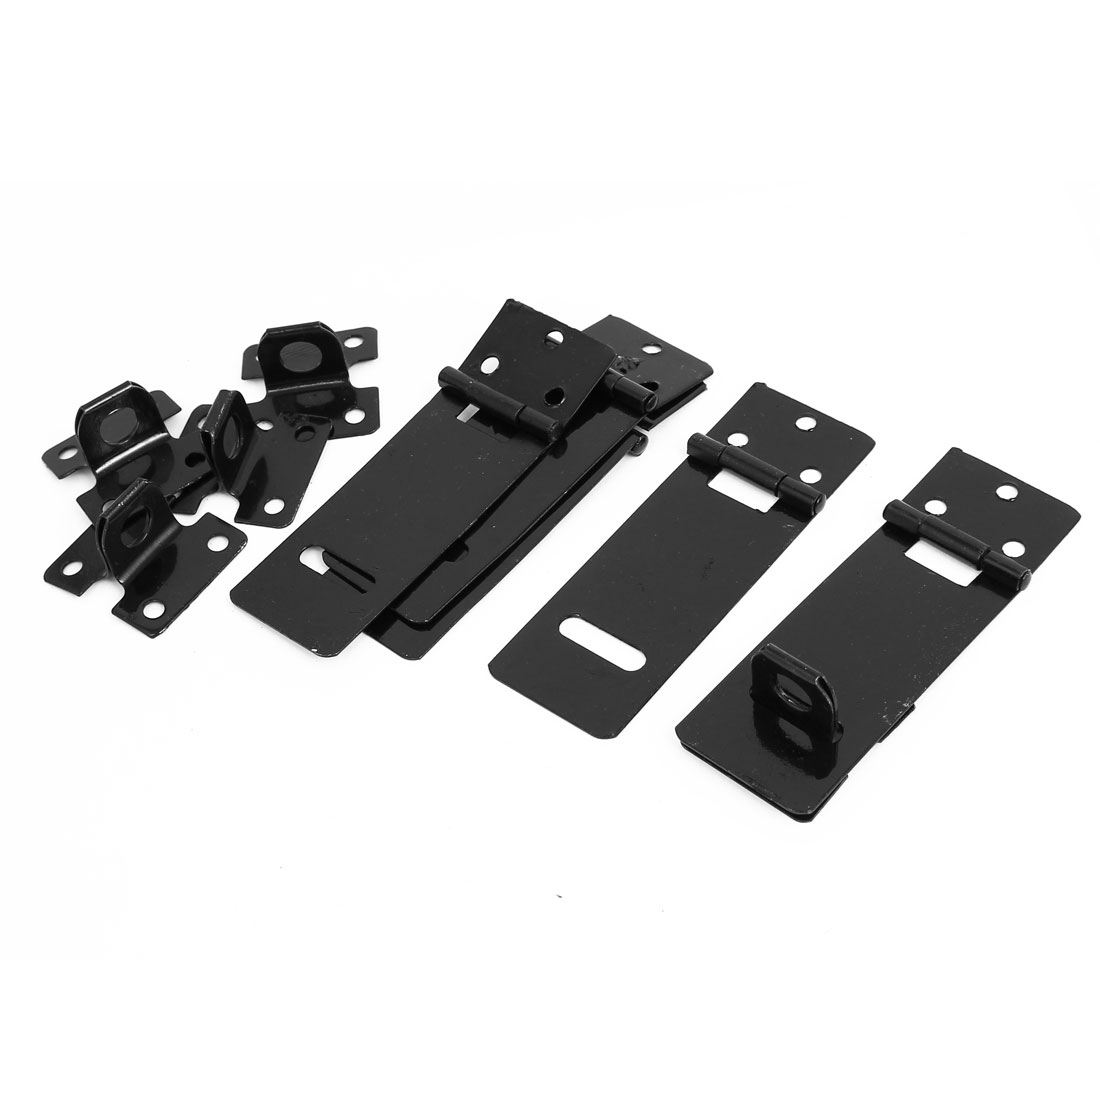 31mm x 95mm Metal Rectangle Gates Door Mate Latch Hasp Staple 5 Sets